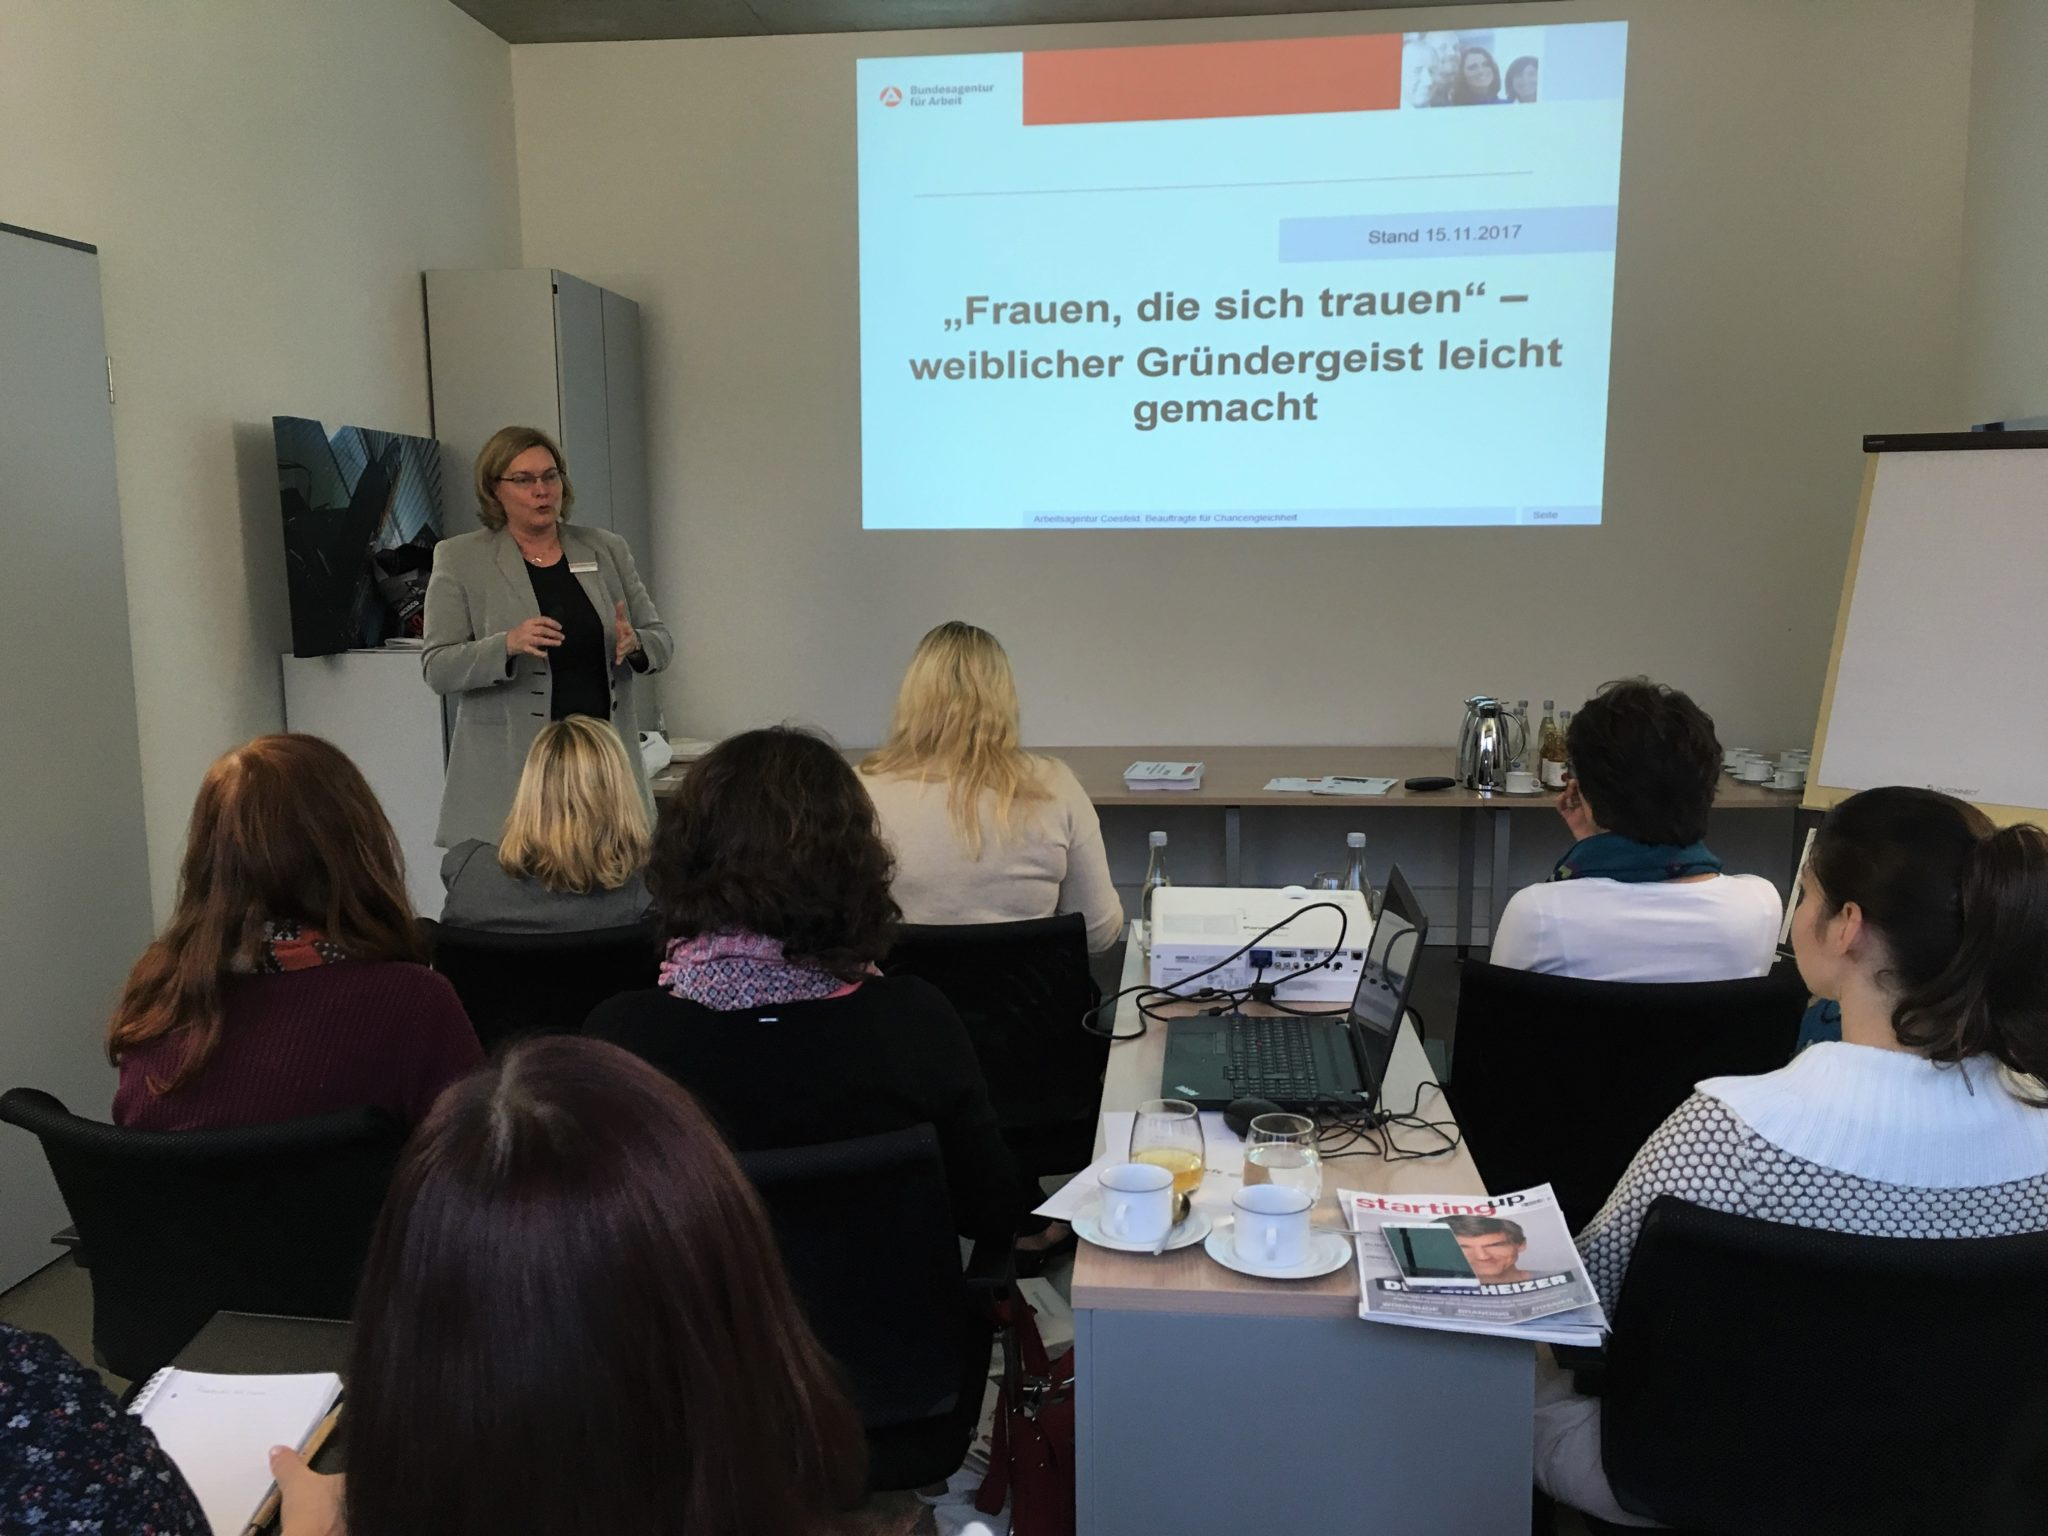 Gründungswoche im Kreis Coesfeld gewinnt an Frauen-Power